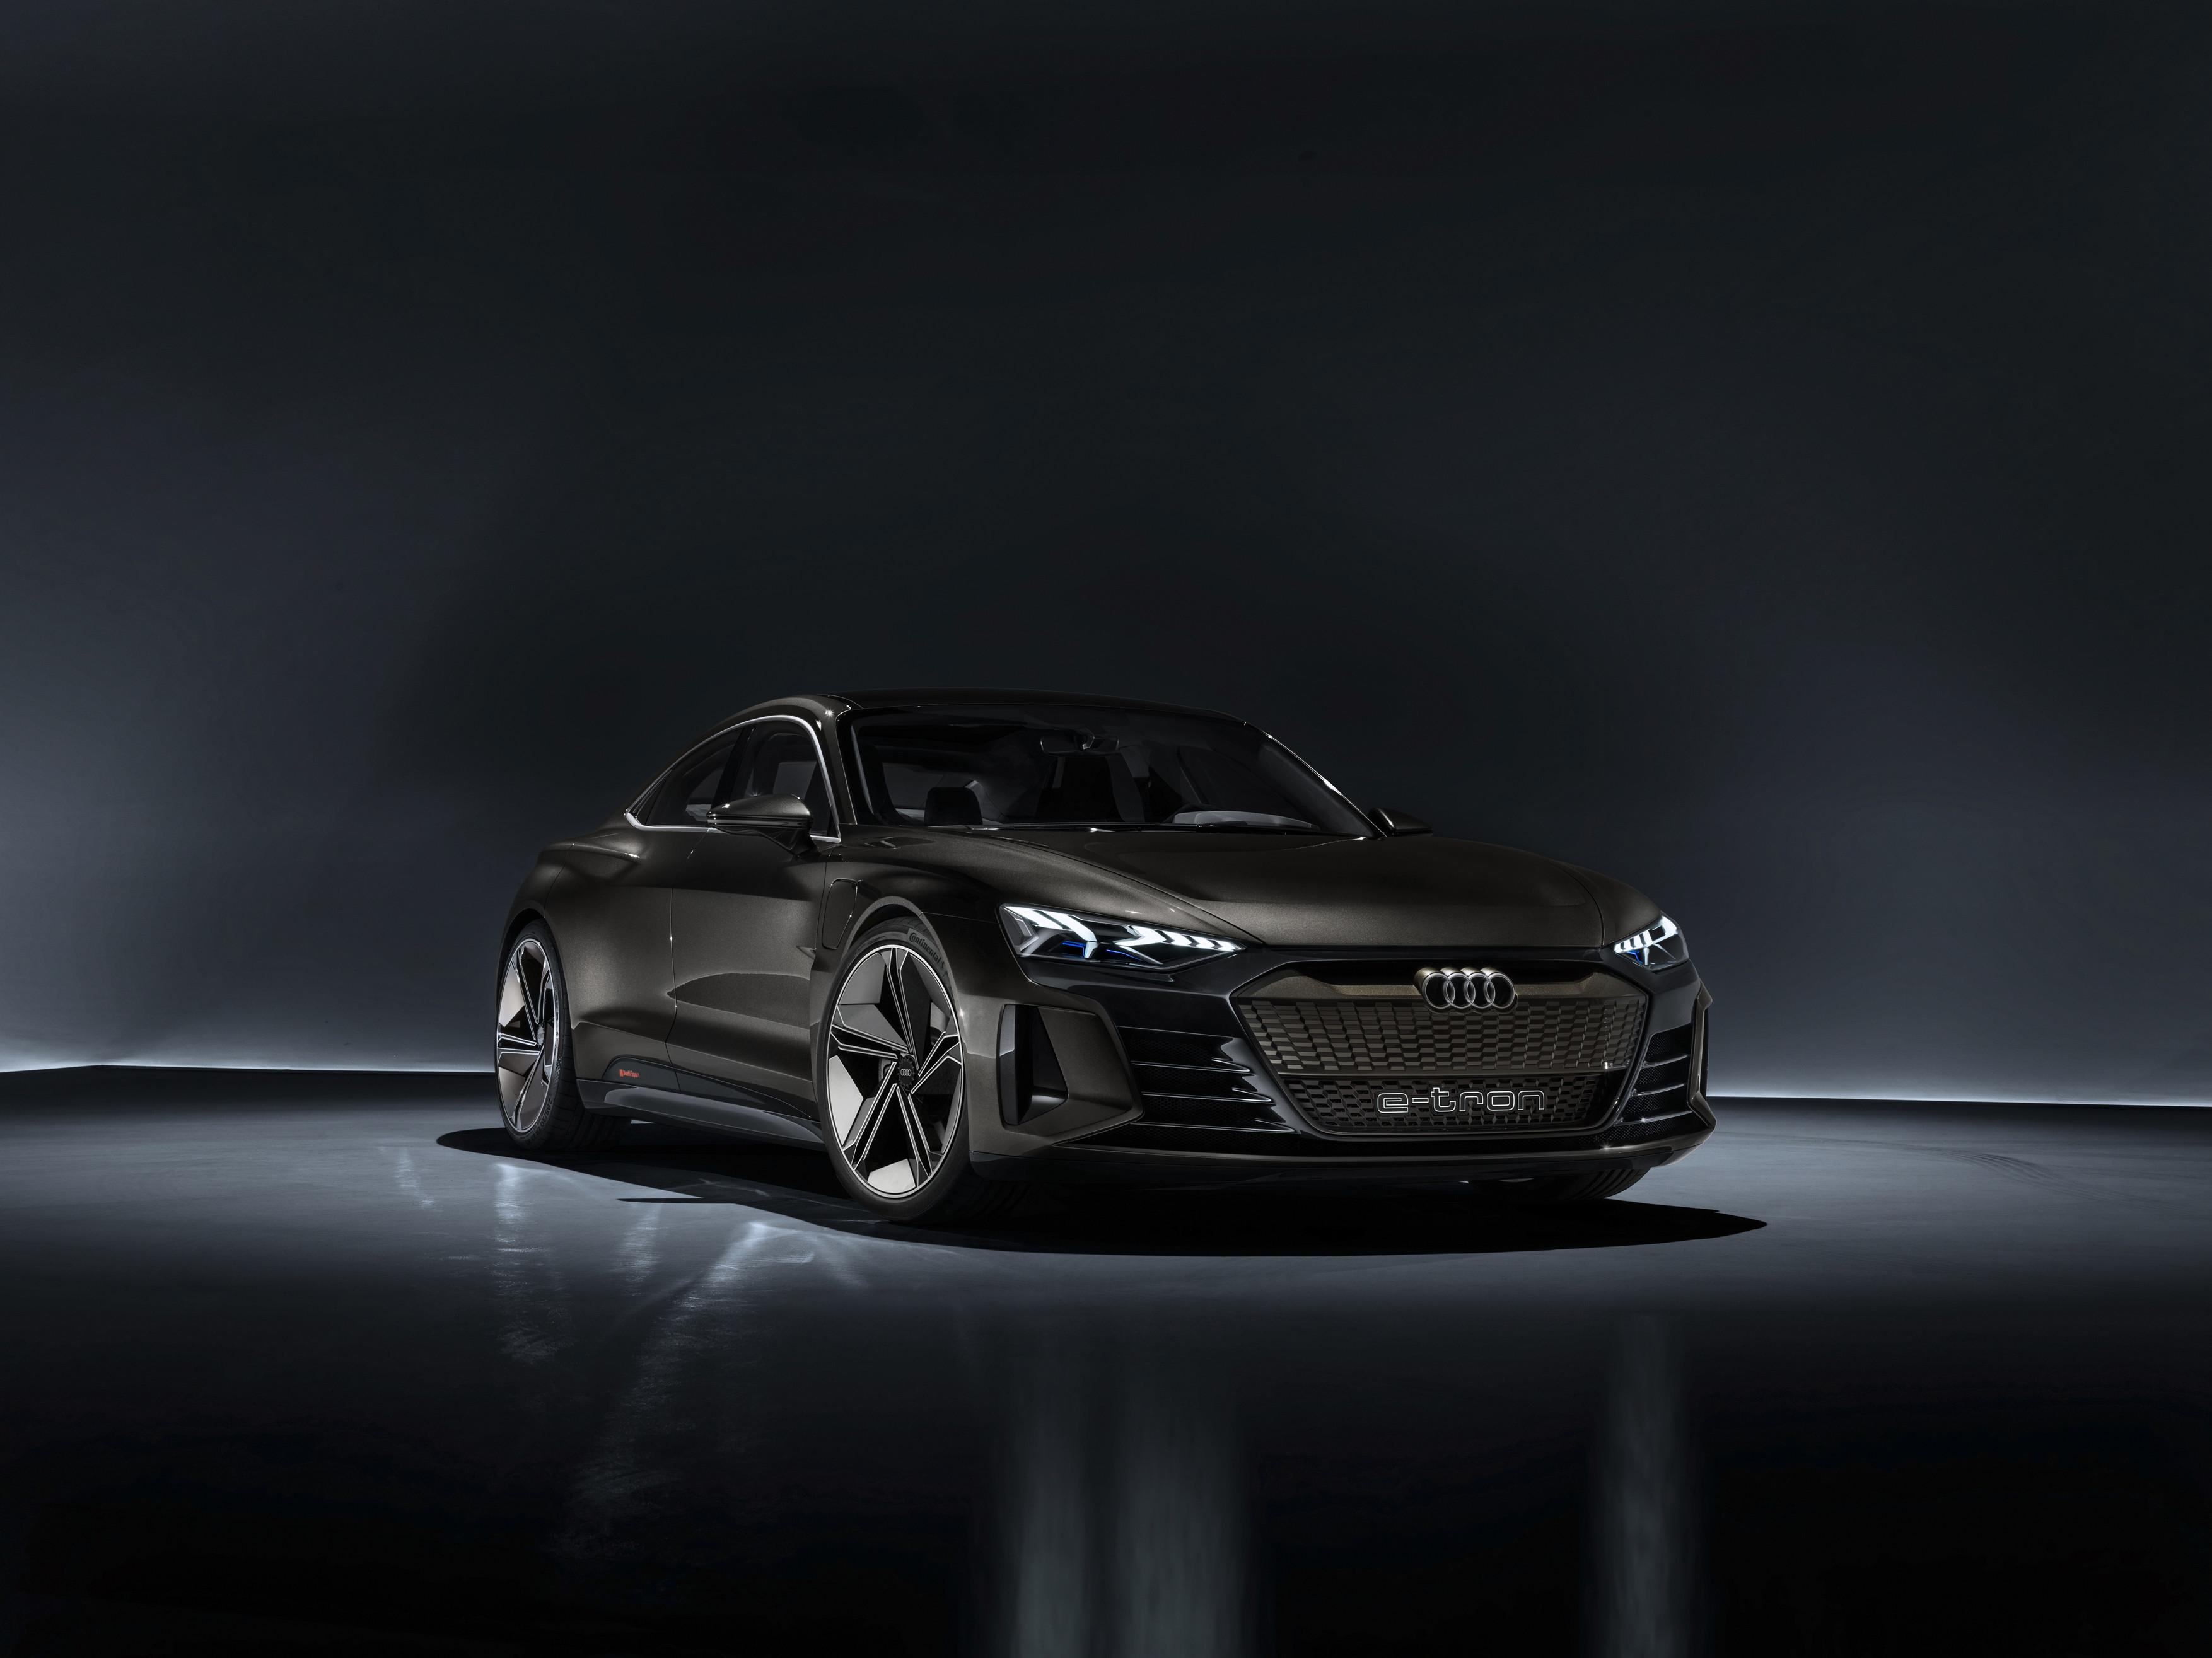 A1814530 medium - Audi E-tron GT concept 4k 2019 - audi etron gt hd 4k 2019 wallpapers, Audi etron 4k wallpapers, audi 2019 etron hd 4k wallpapers